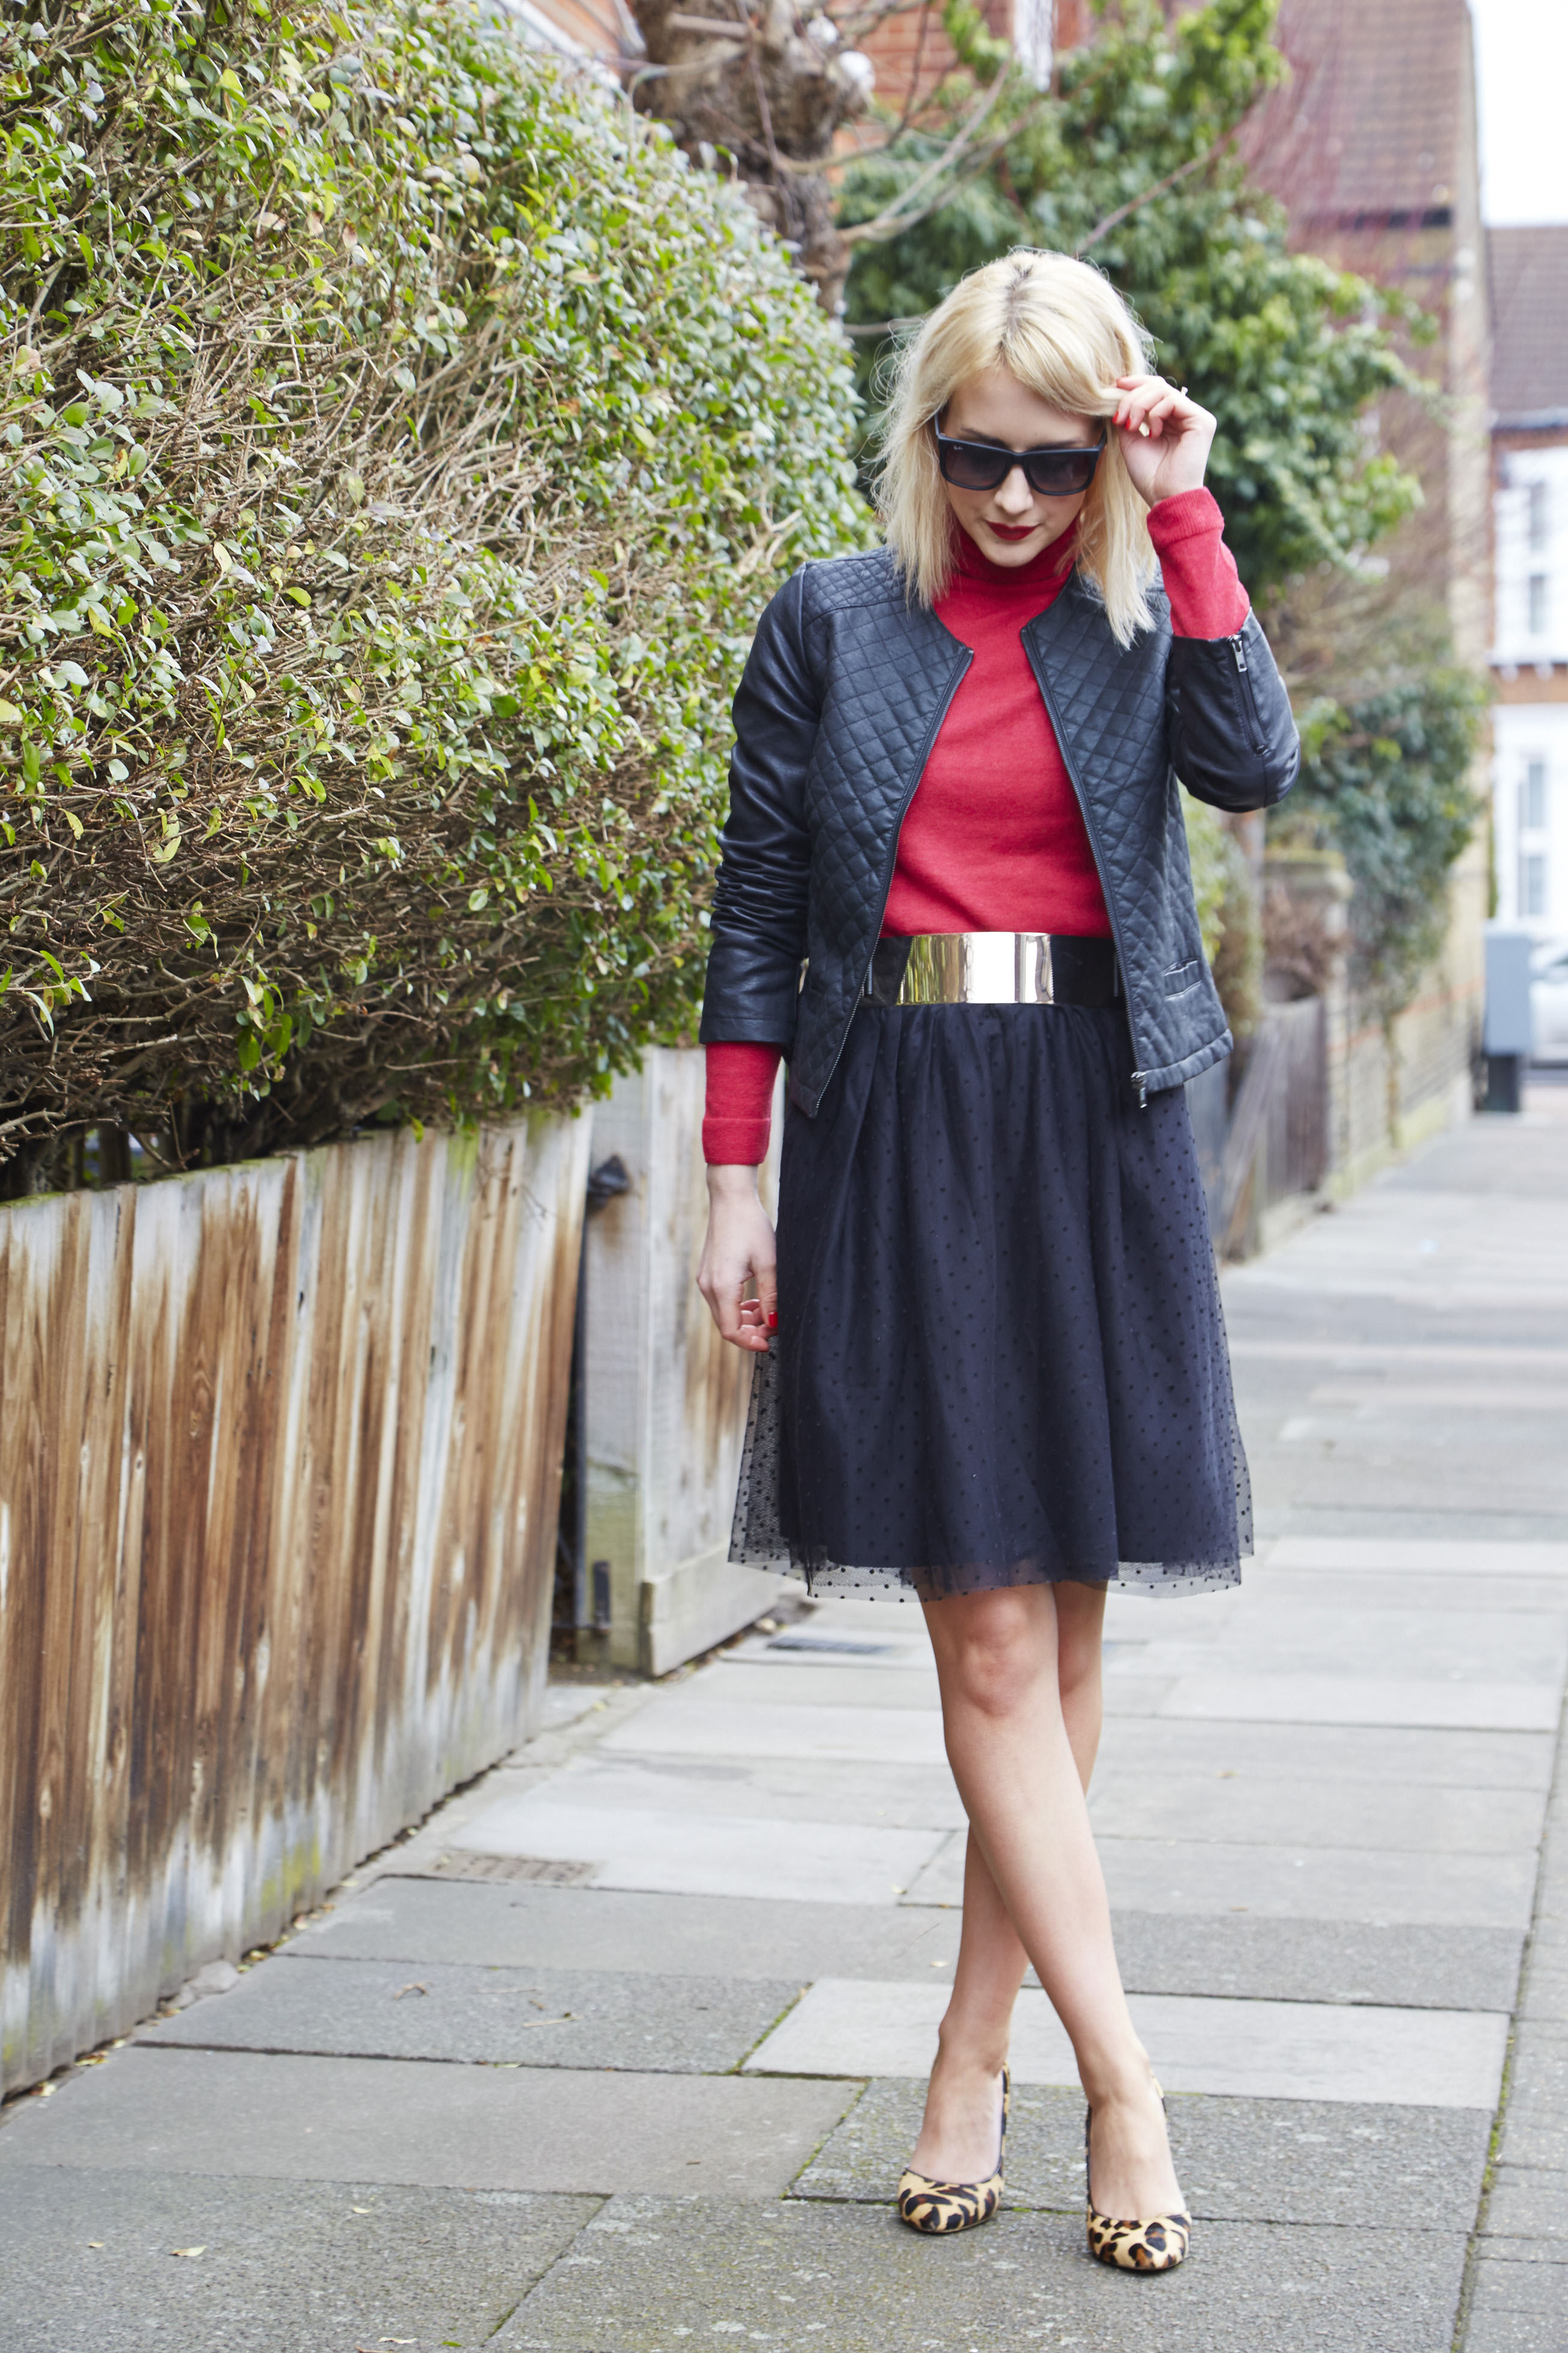 Tags french fashion la redoute secrets to french style style - Tags French Fashion La Redoute Secrets To French Style Style 5